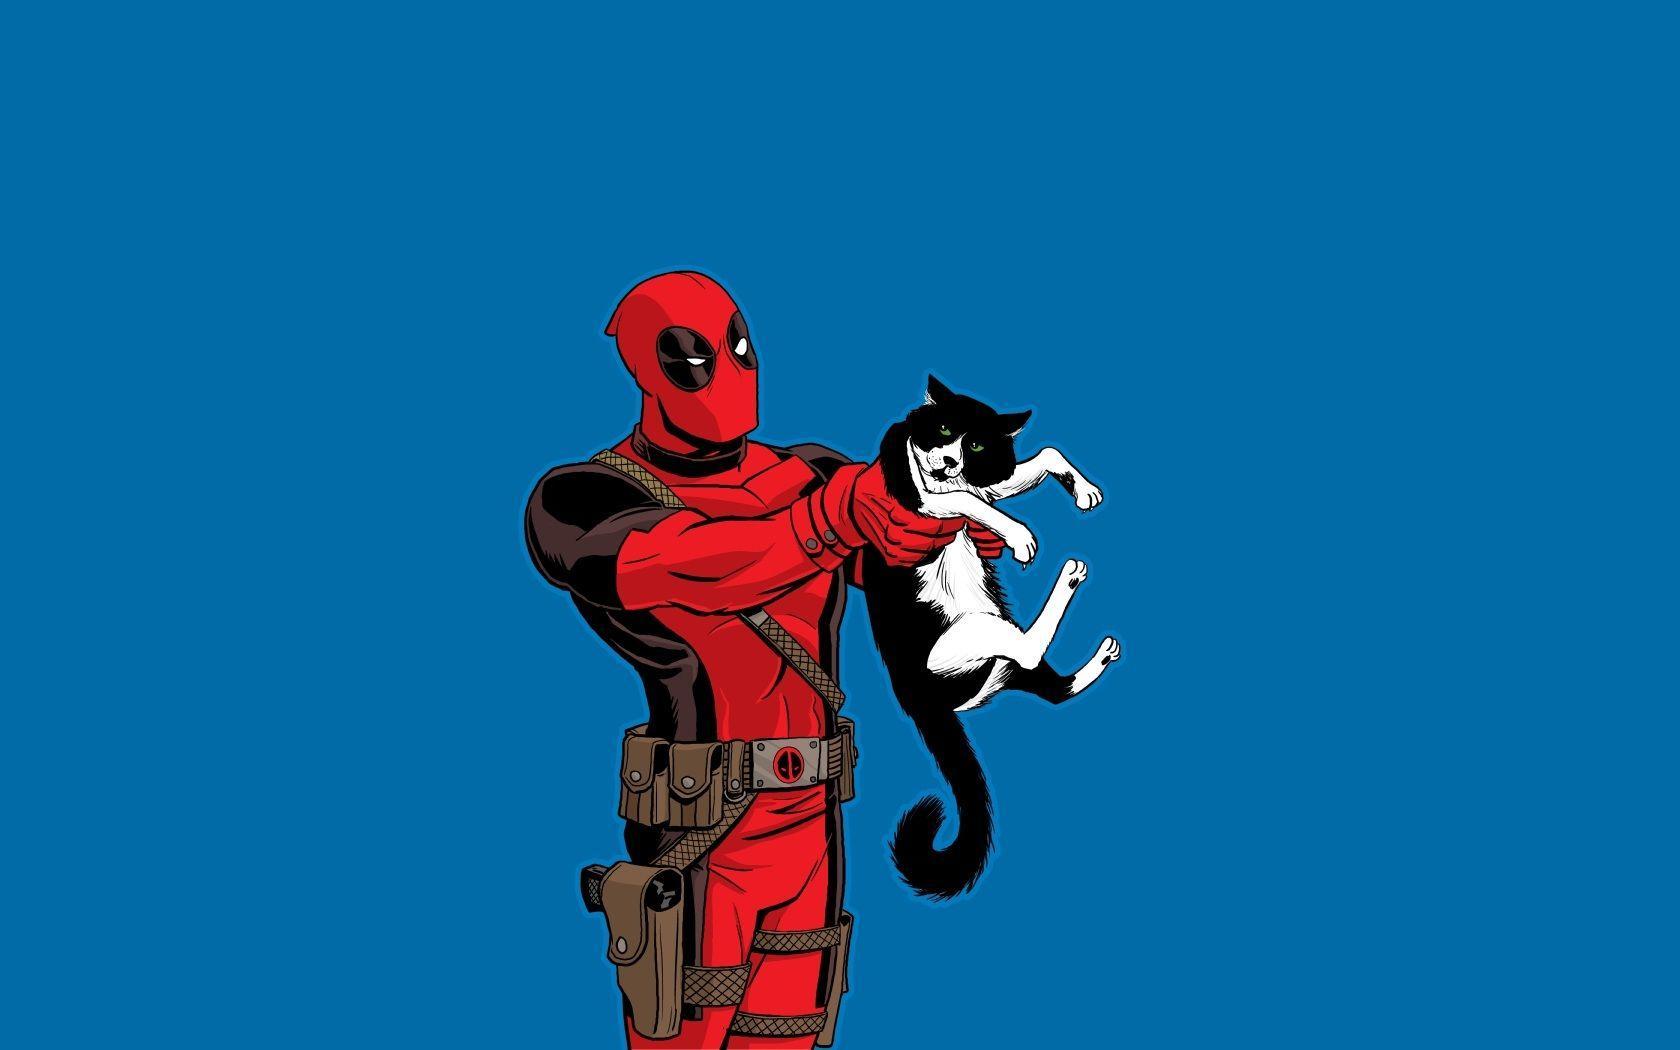 Deadpool Ipad Wallpapers Top Free Deadpool Ipad Backgrounds